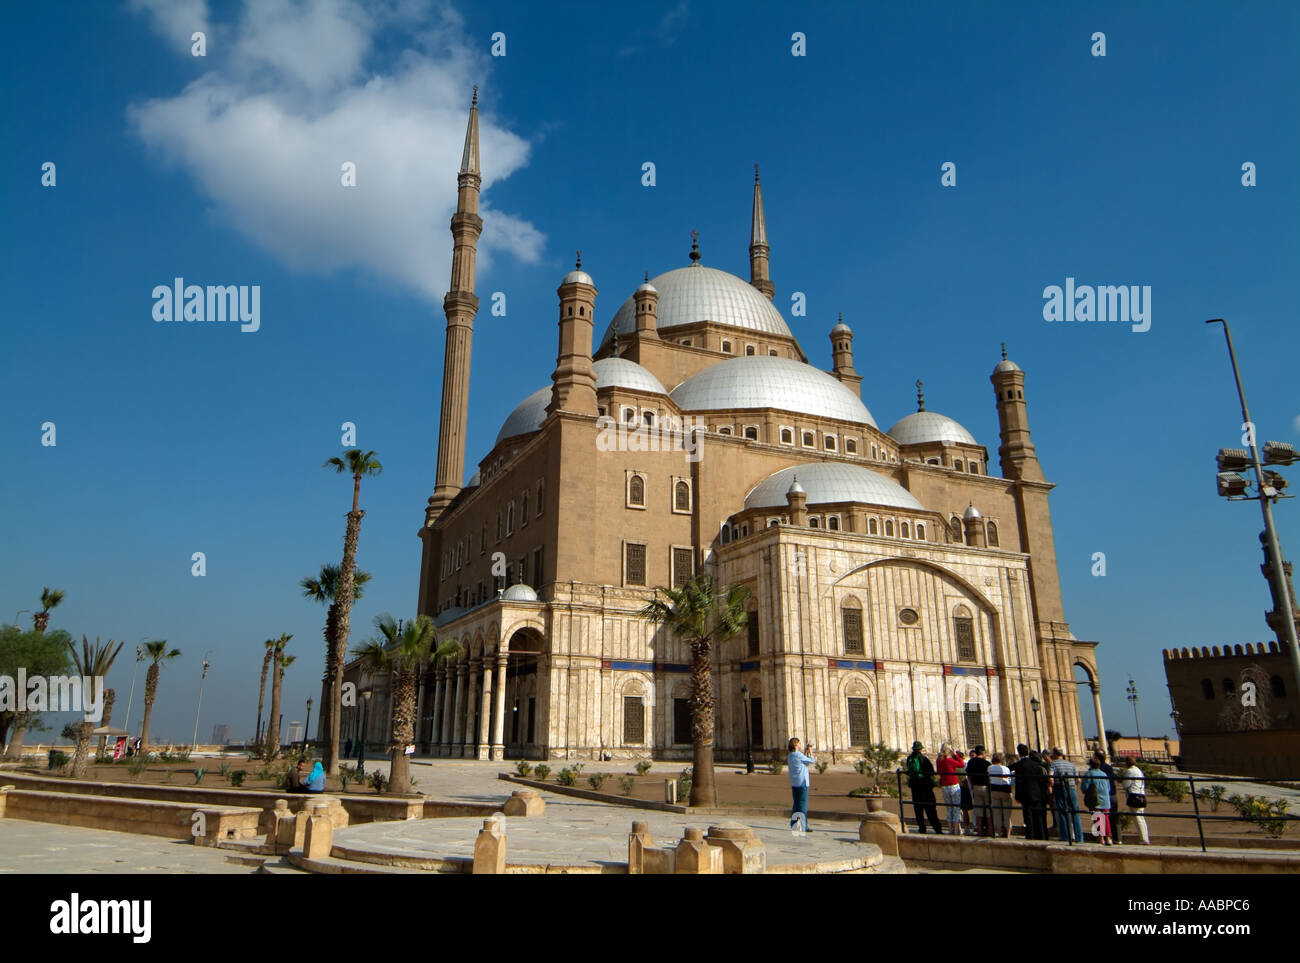 Muhammad Ali Mosque, Citadel, Cairo, Egypt - Stock Image